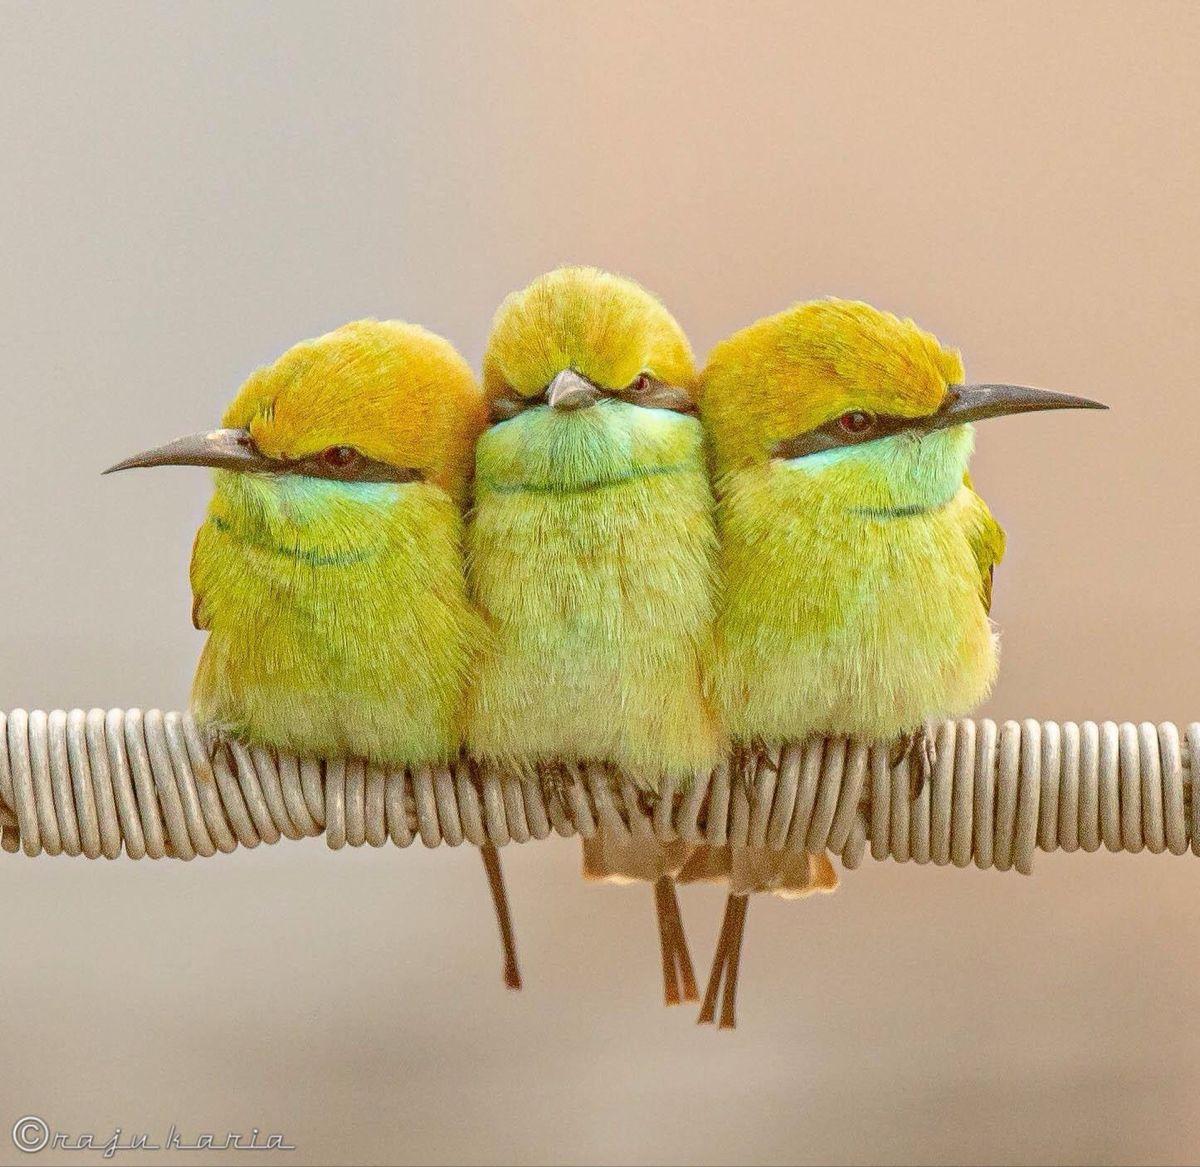 Pin By Kurdistan On Nature Bird Pictures Bee Eater Bird